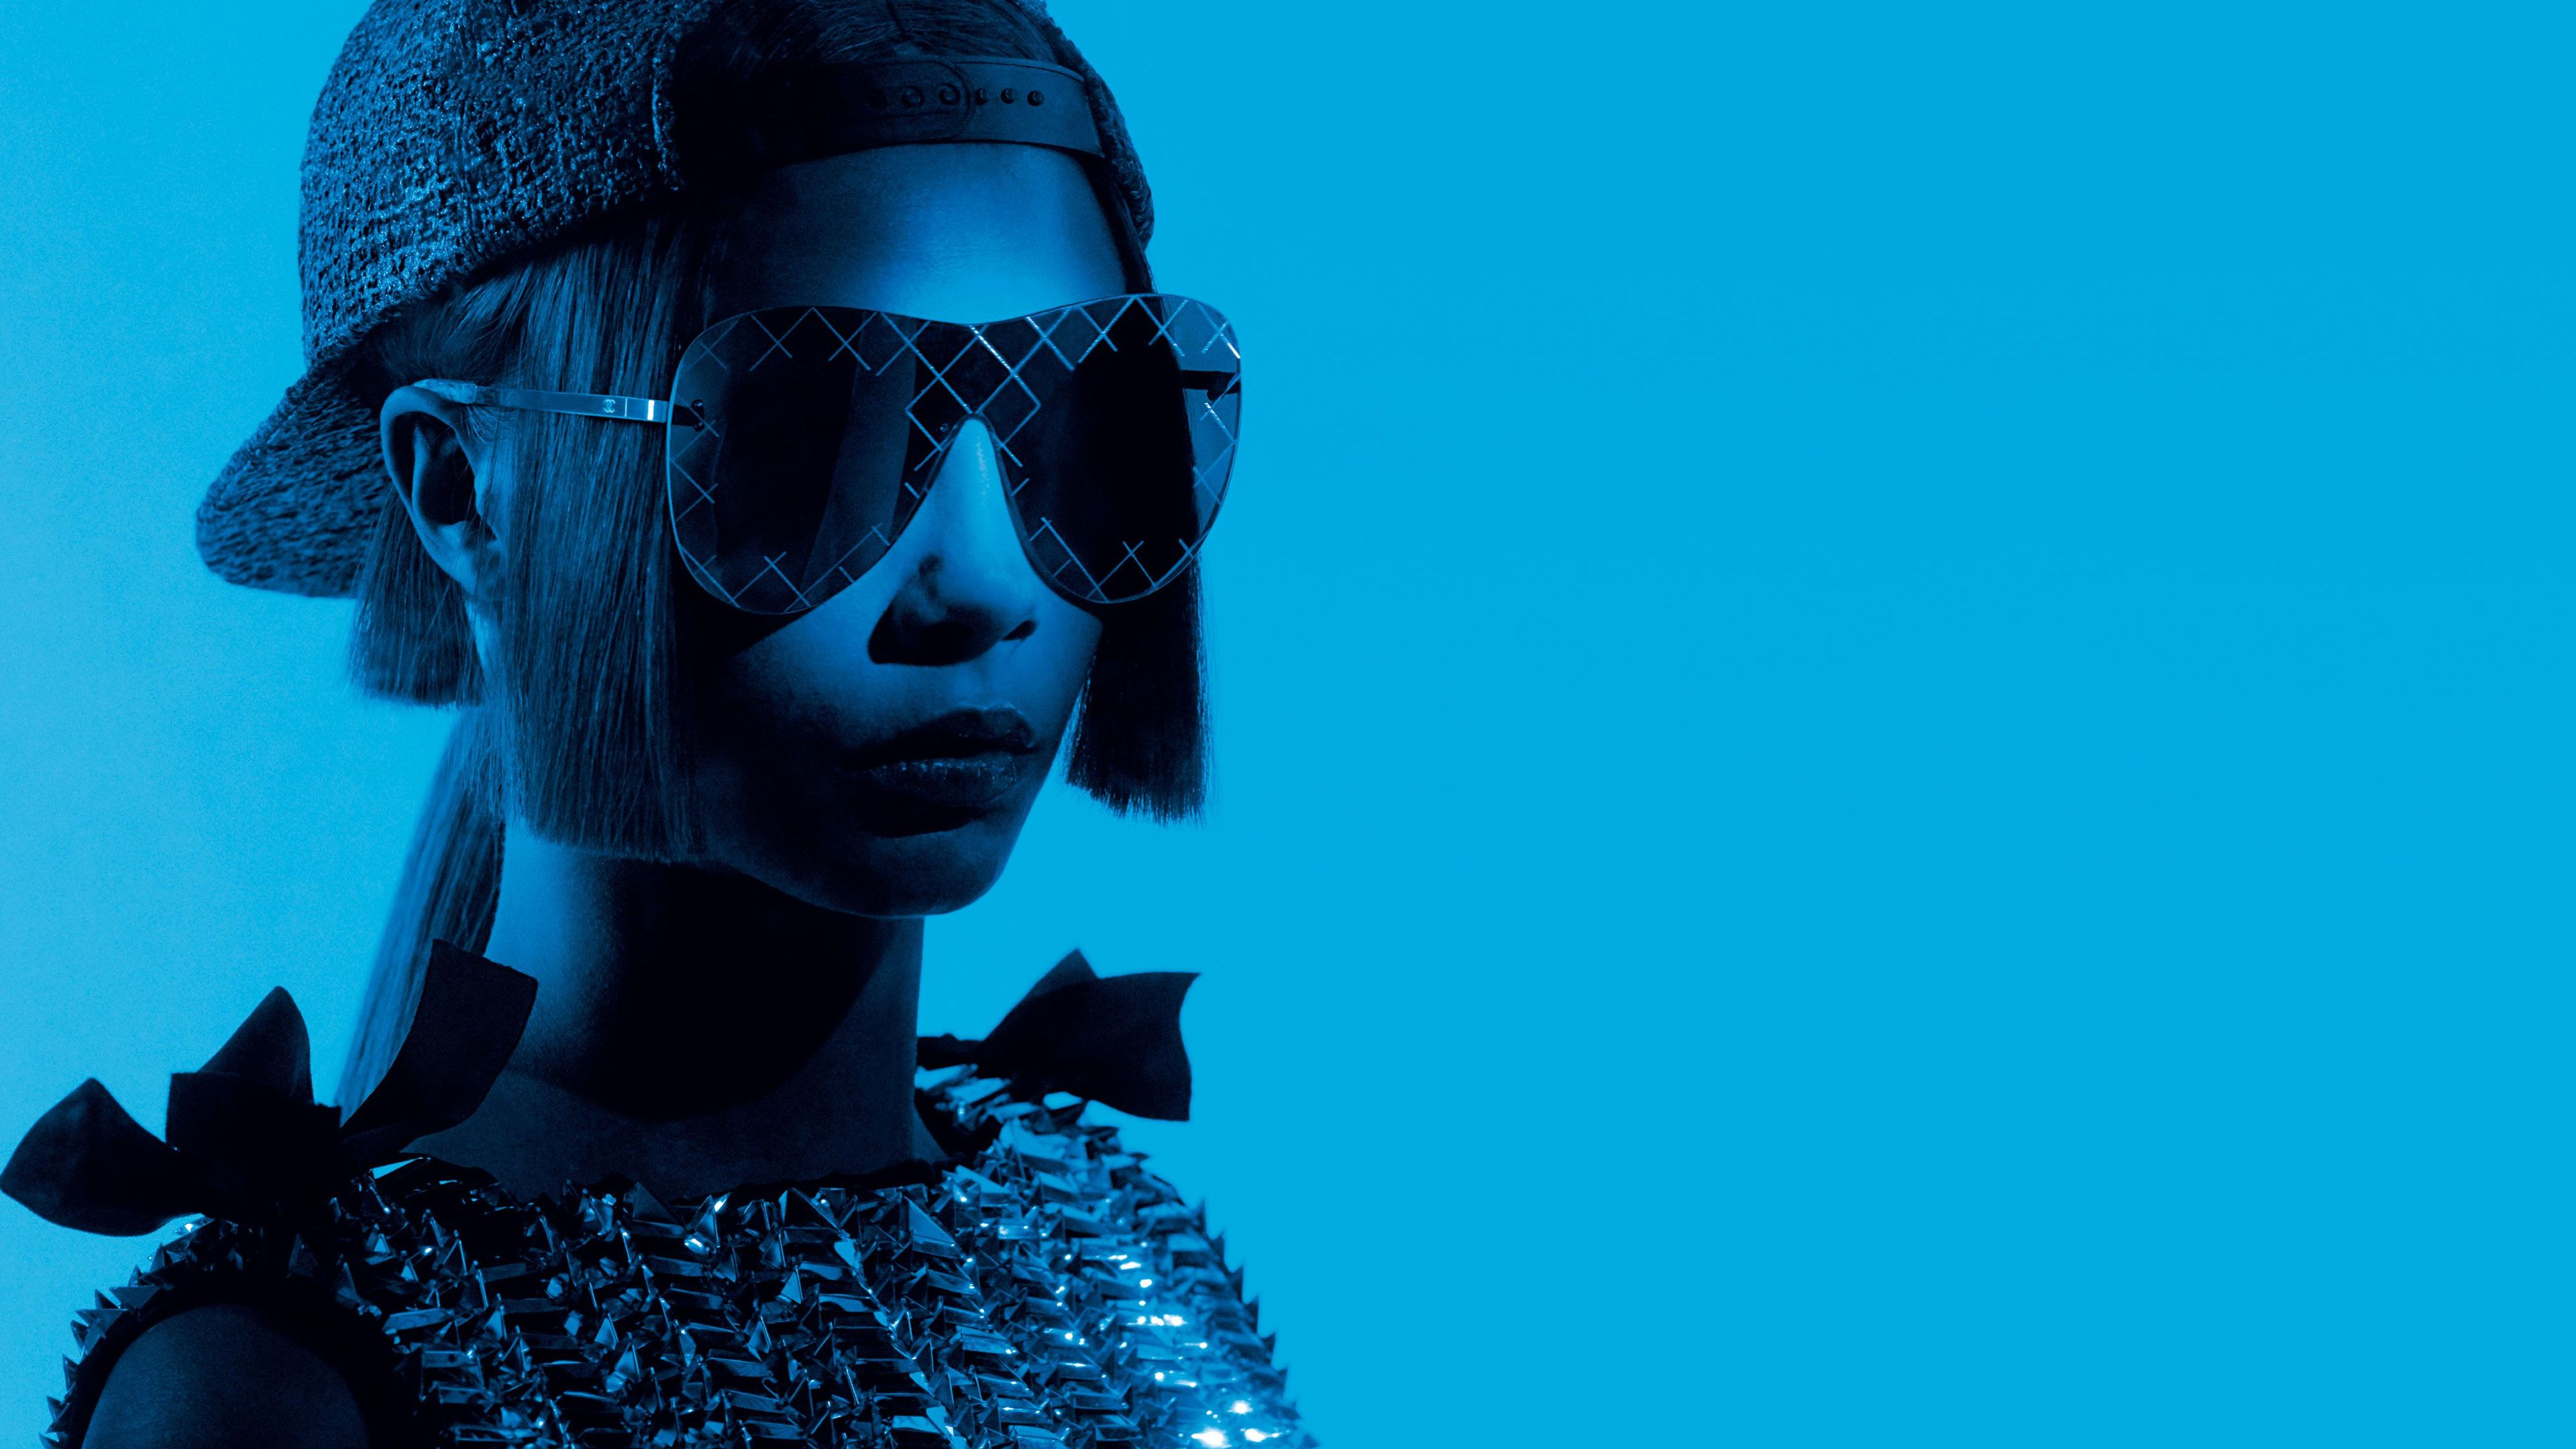 cara delevingne chanel eyewear photoshoot 1536863043 - Cara Delevingne Chanel Eyewear Photoshoot - photoshoot wallpapers, hd-wallpapers, girls wallpapers, celebrities wallpapers, cara delevingne wallpapers